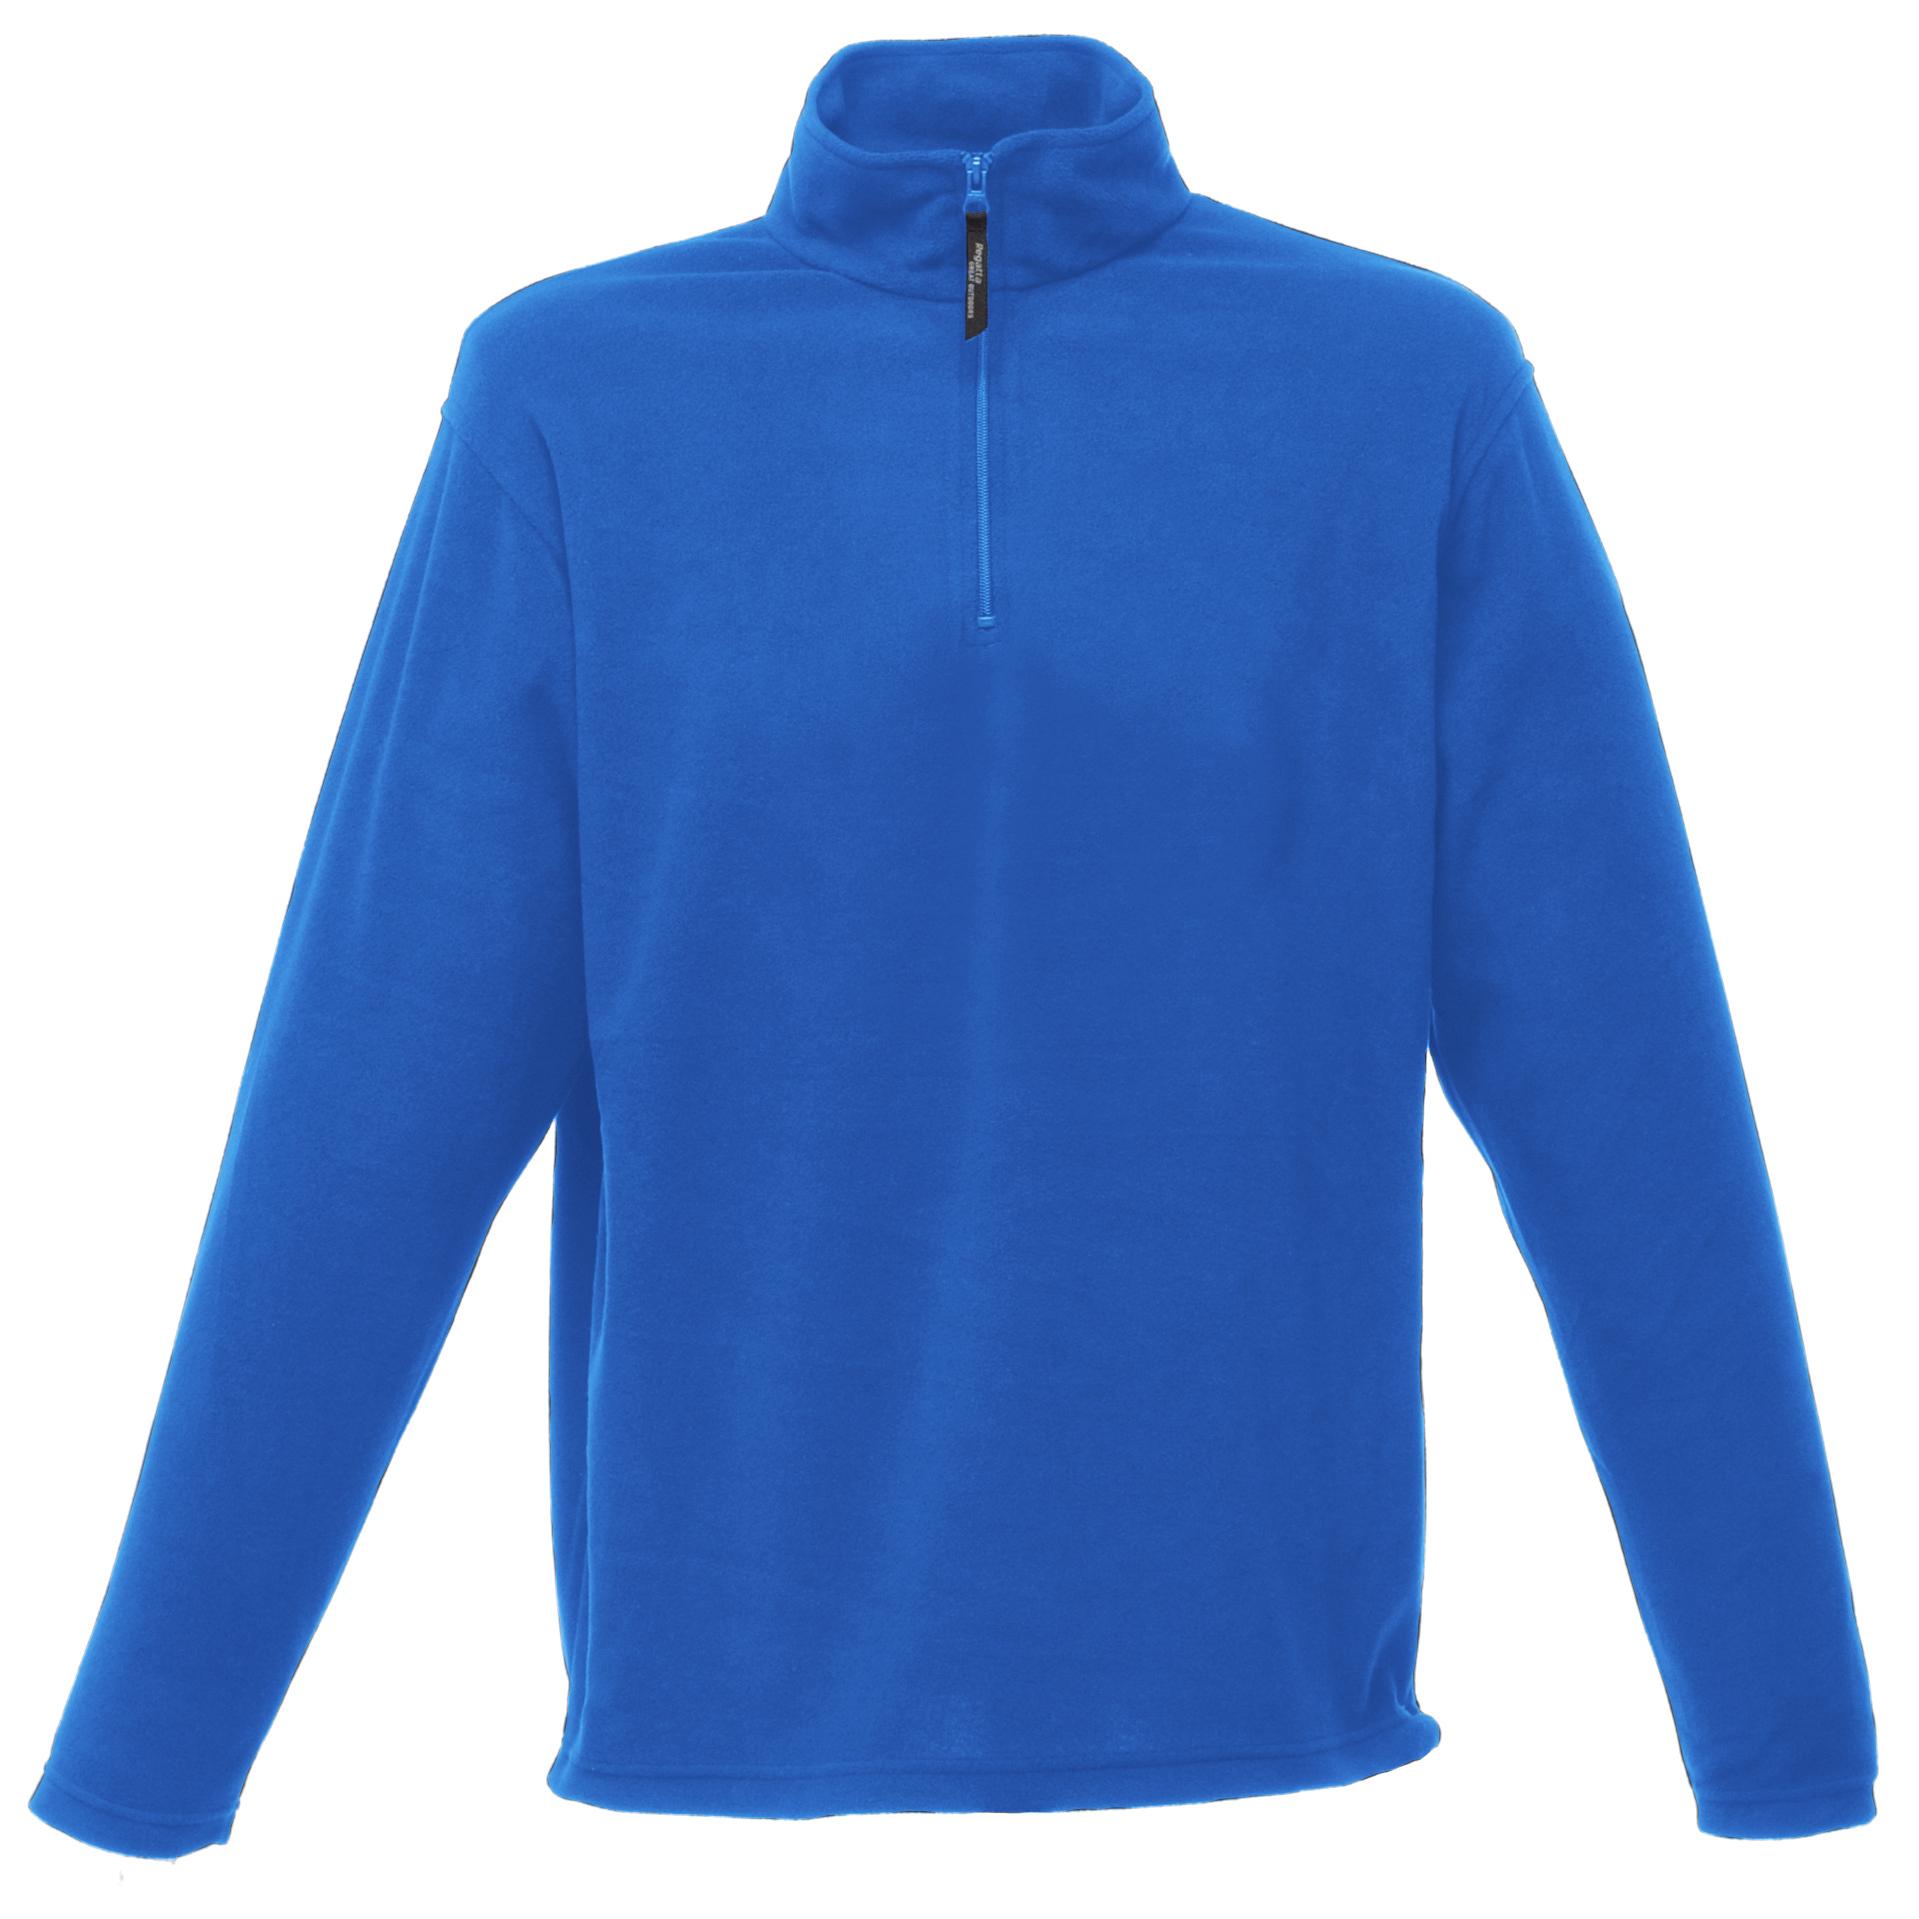 Regatta Mens 170 Series Anti-pill Zip Neck Micro Fleece Jacket (M) (Royal Blue)